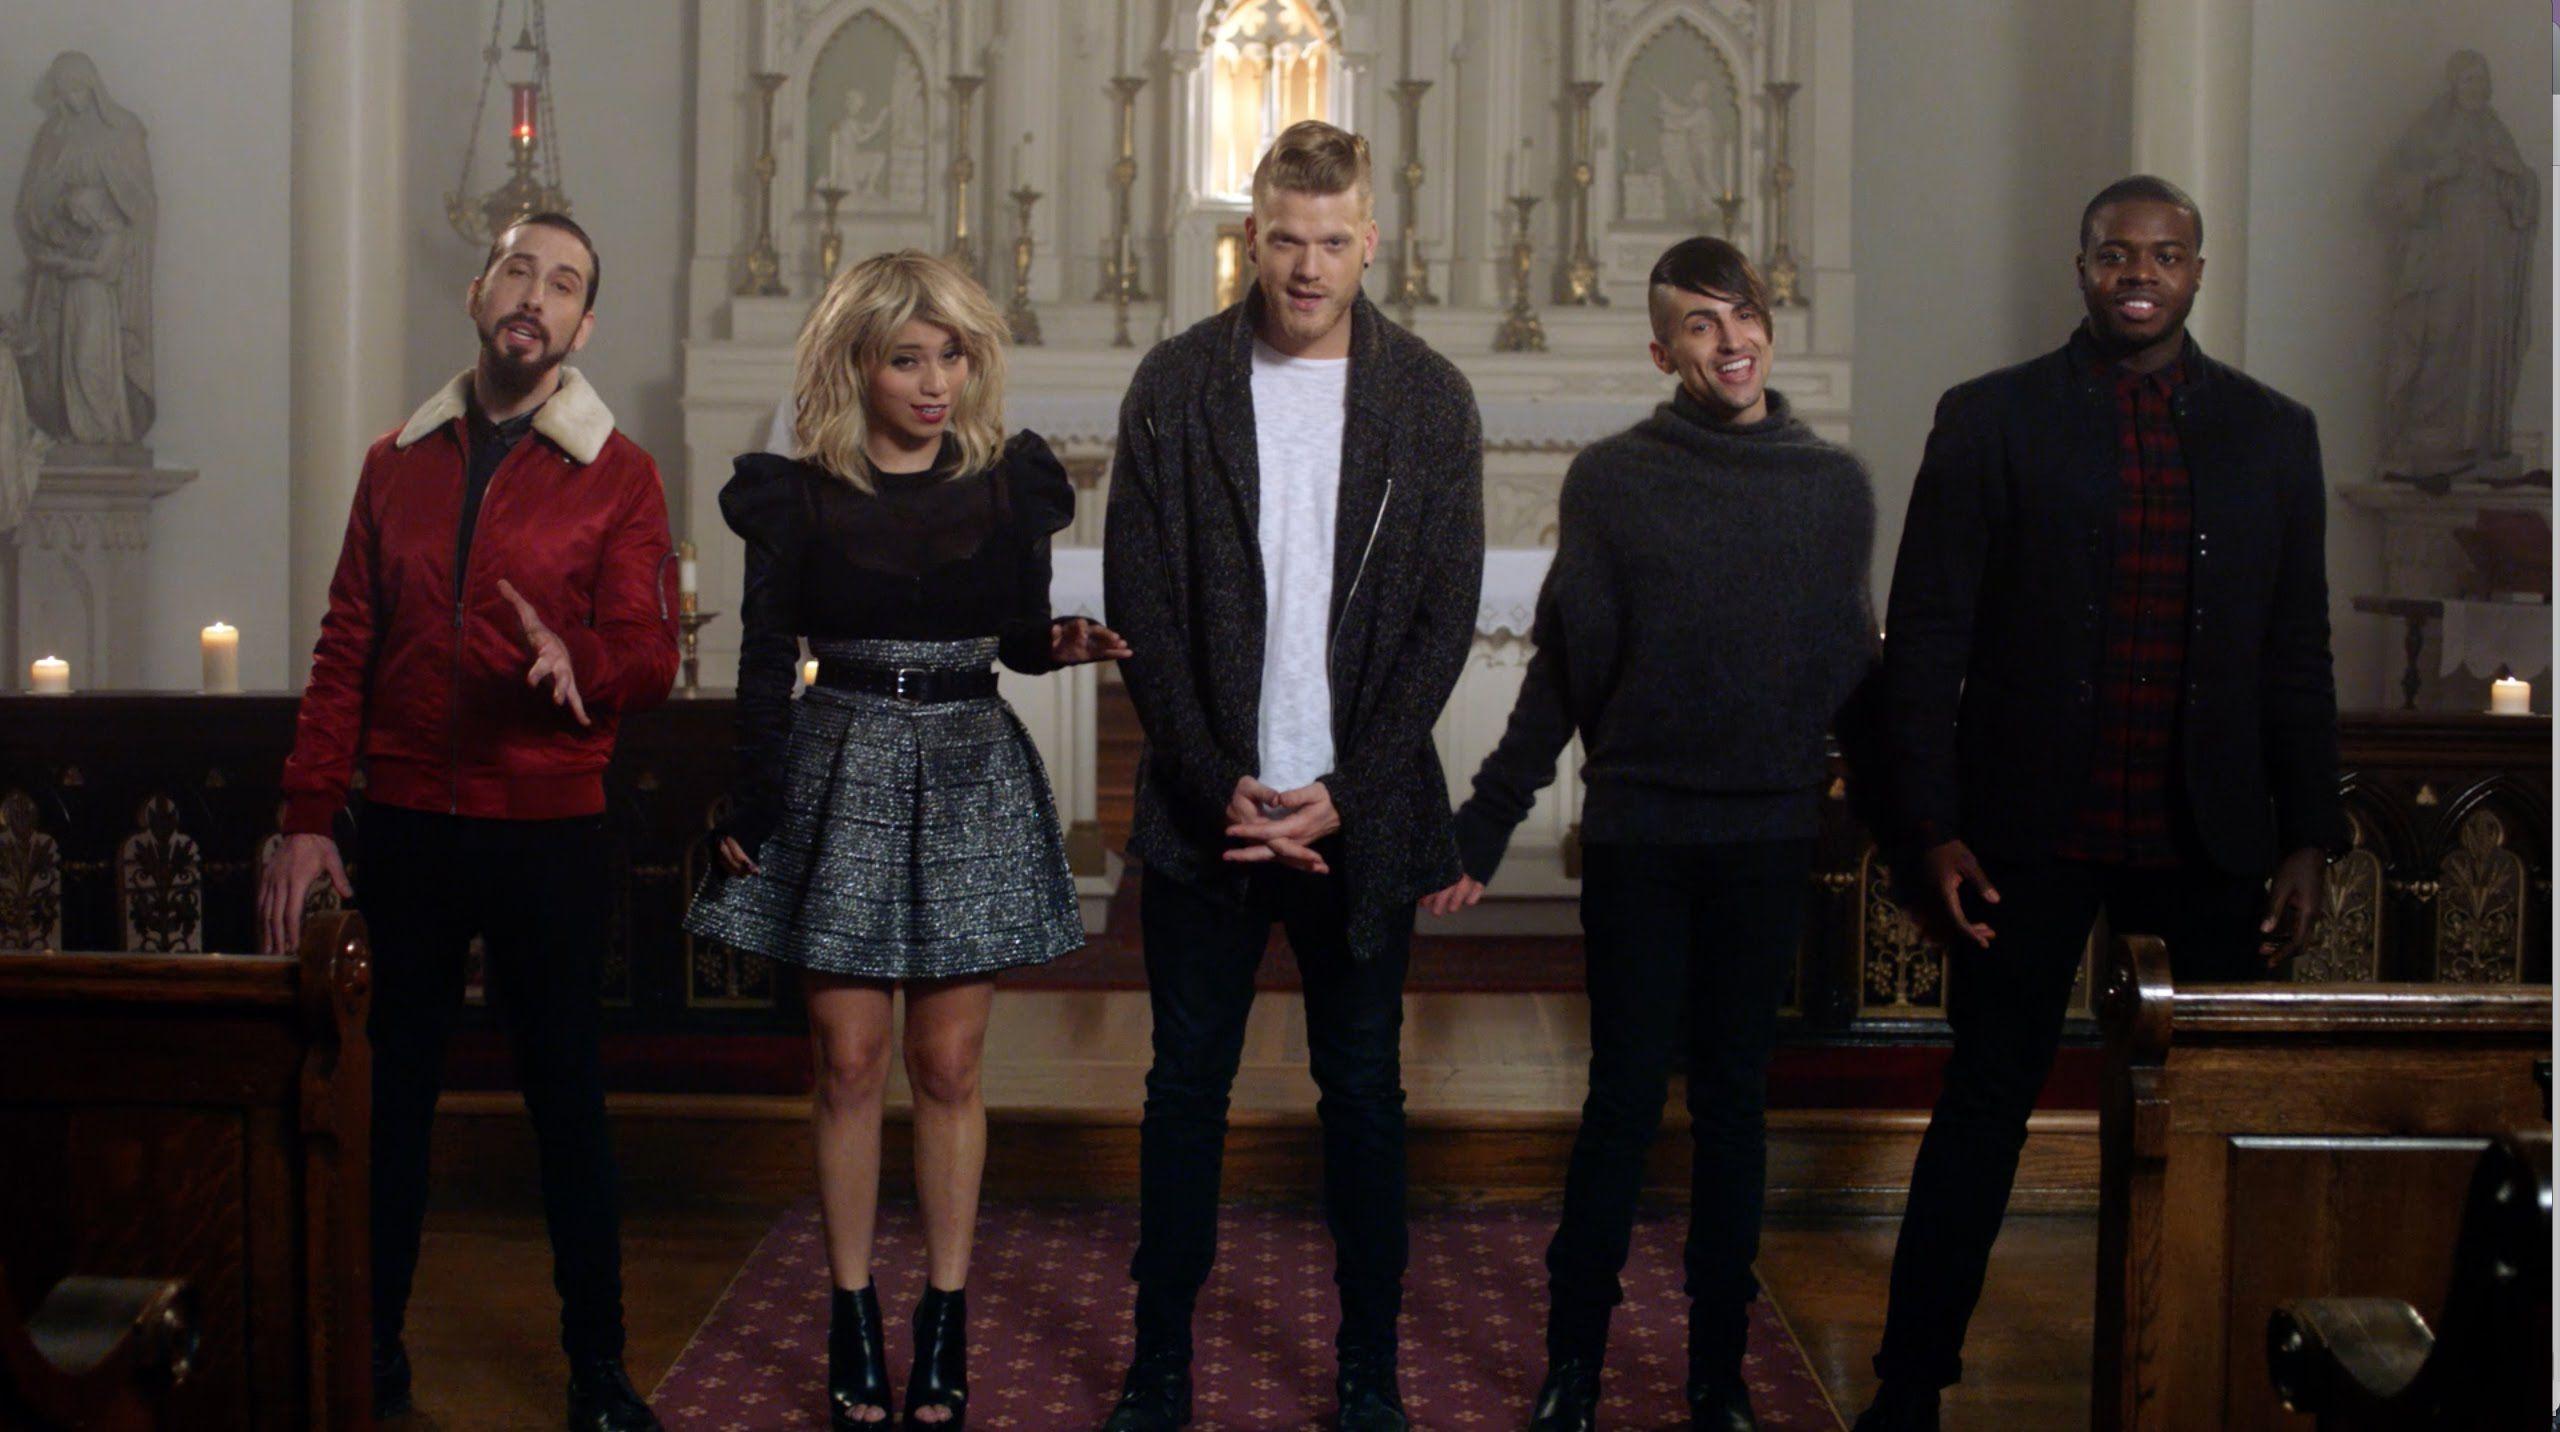 Official Video Joy To The World Pentatonix Pentatonix Christmas Music Videos Best Christmas Songs